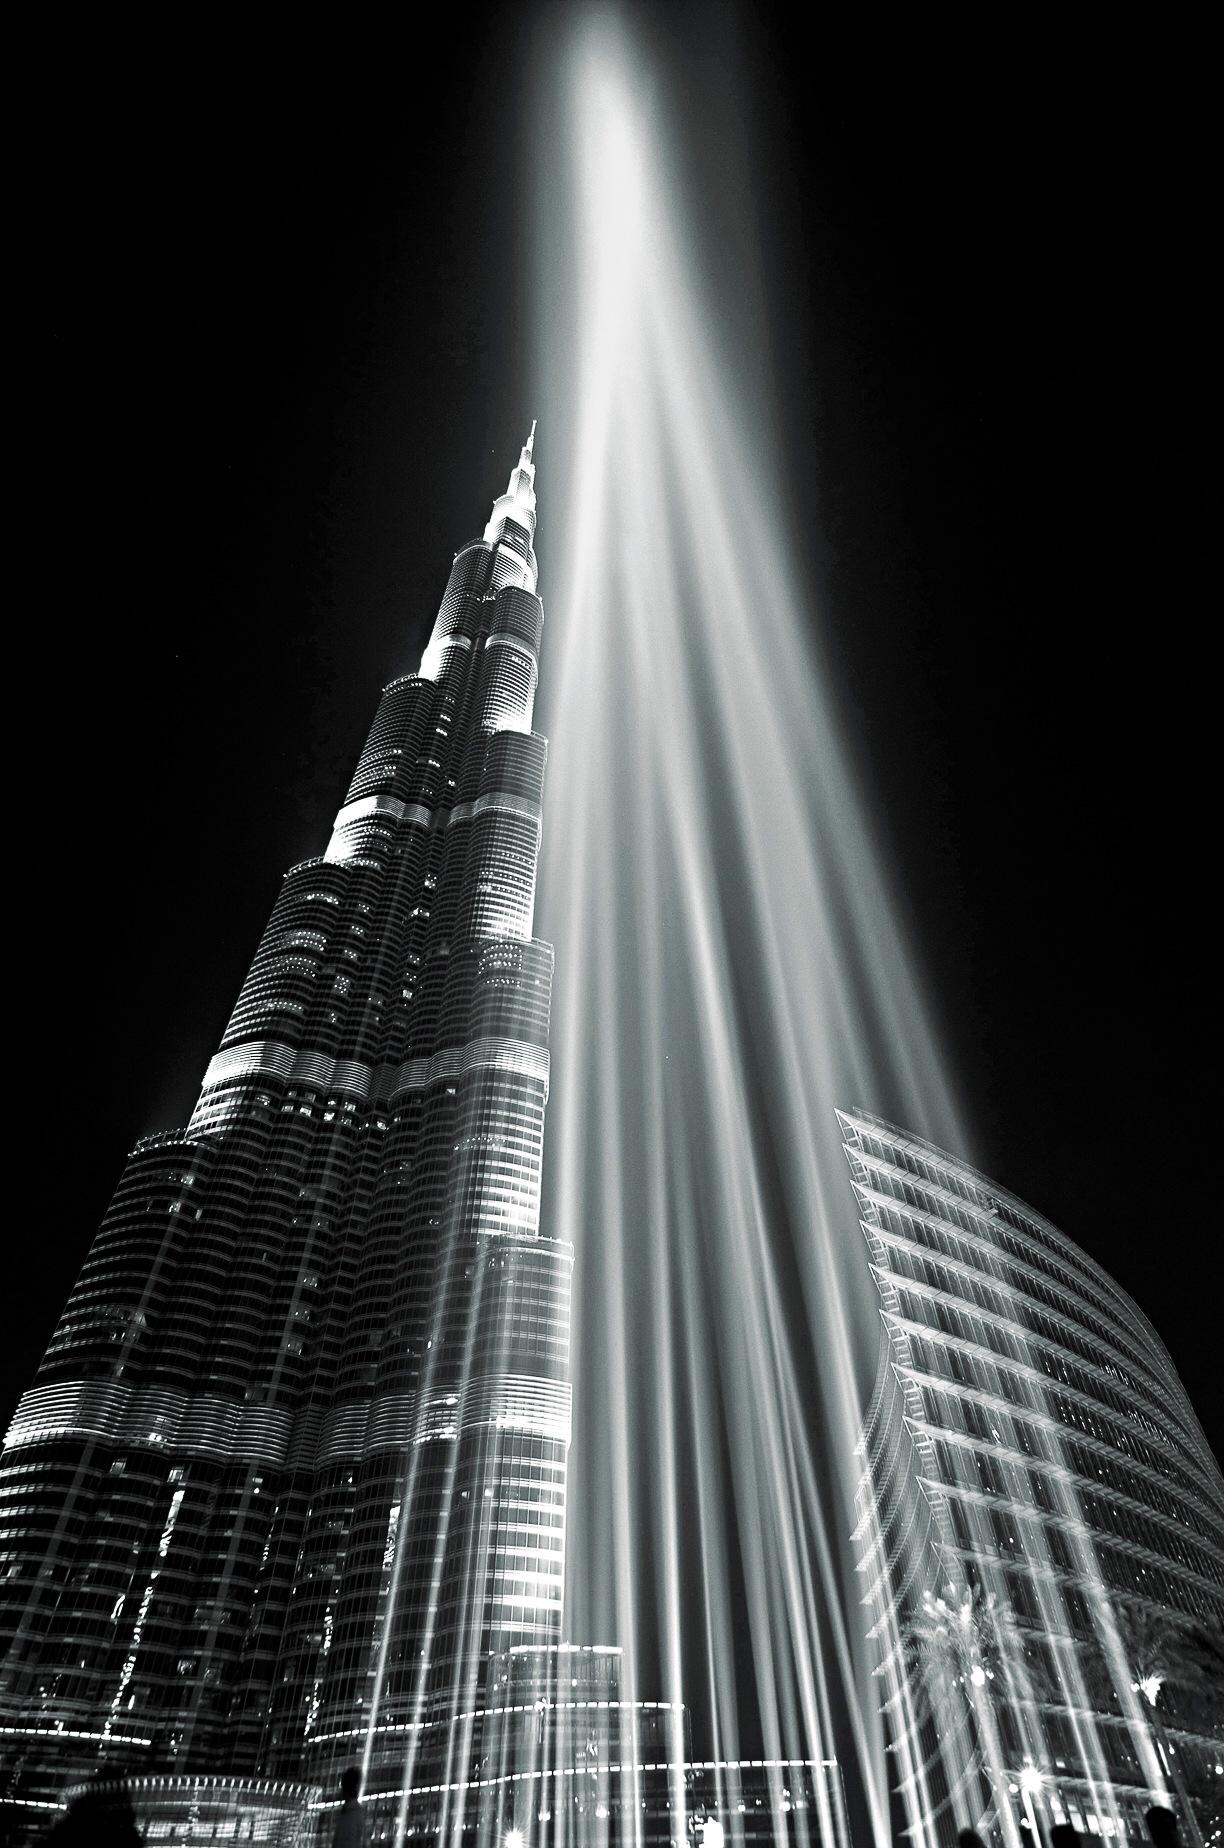 Burj Khalifa lasers in monochrome  by MrBpix